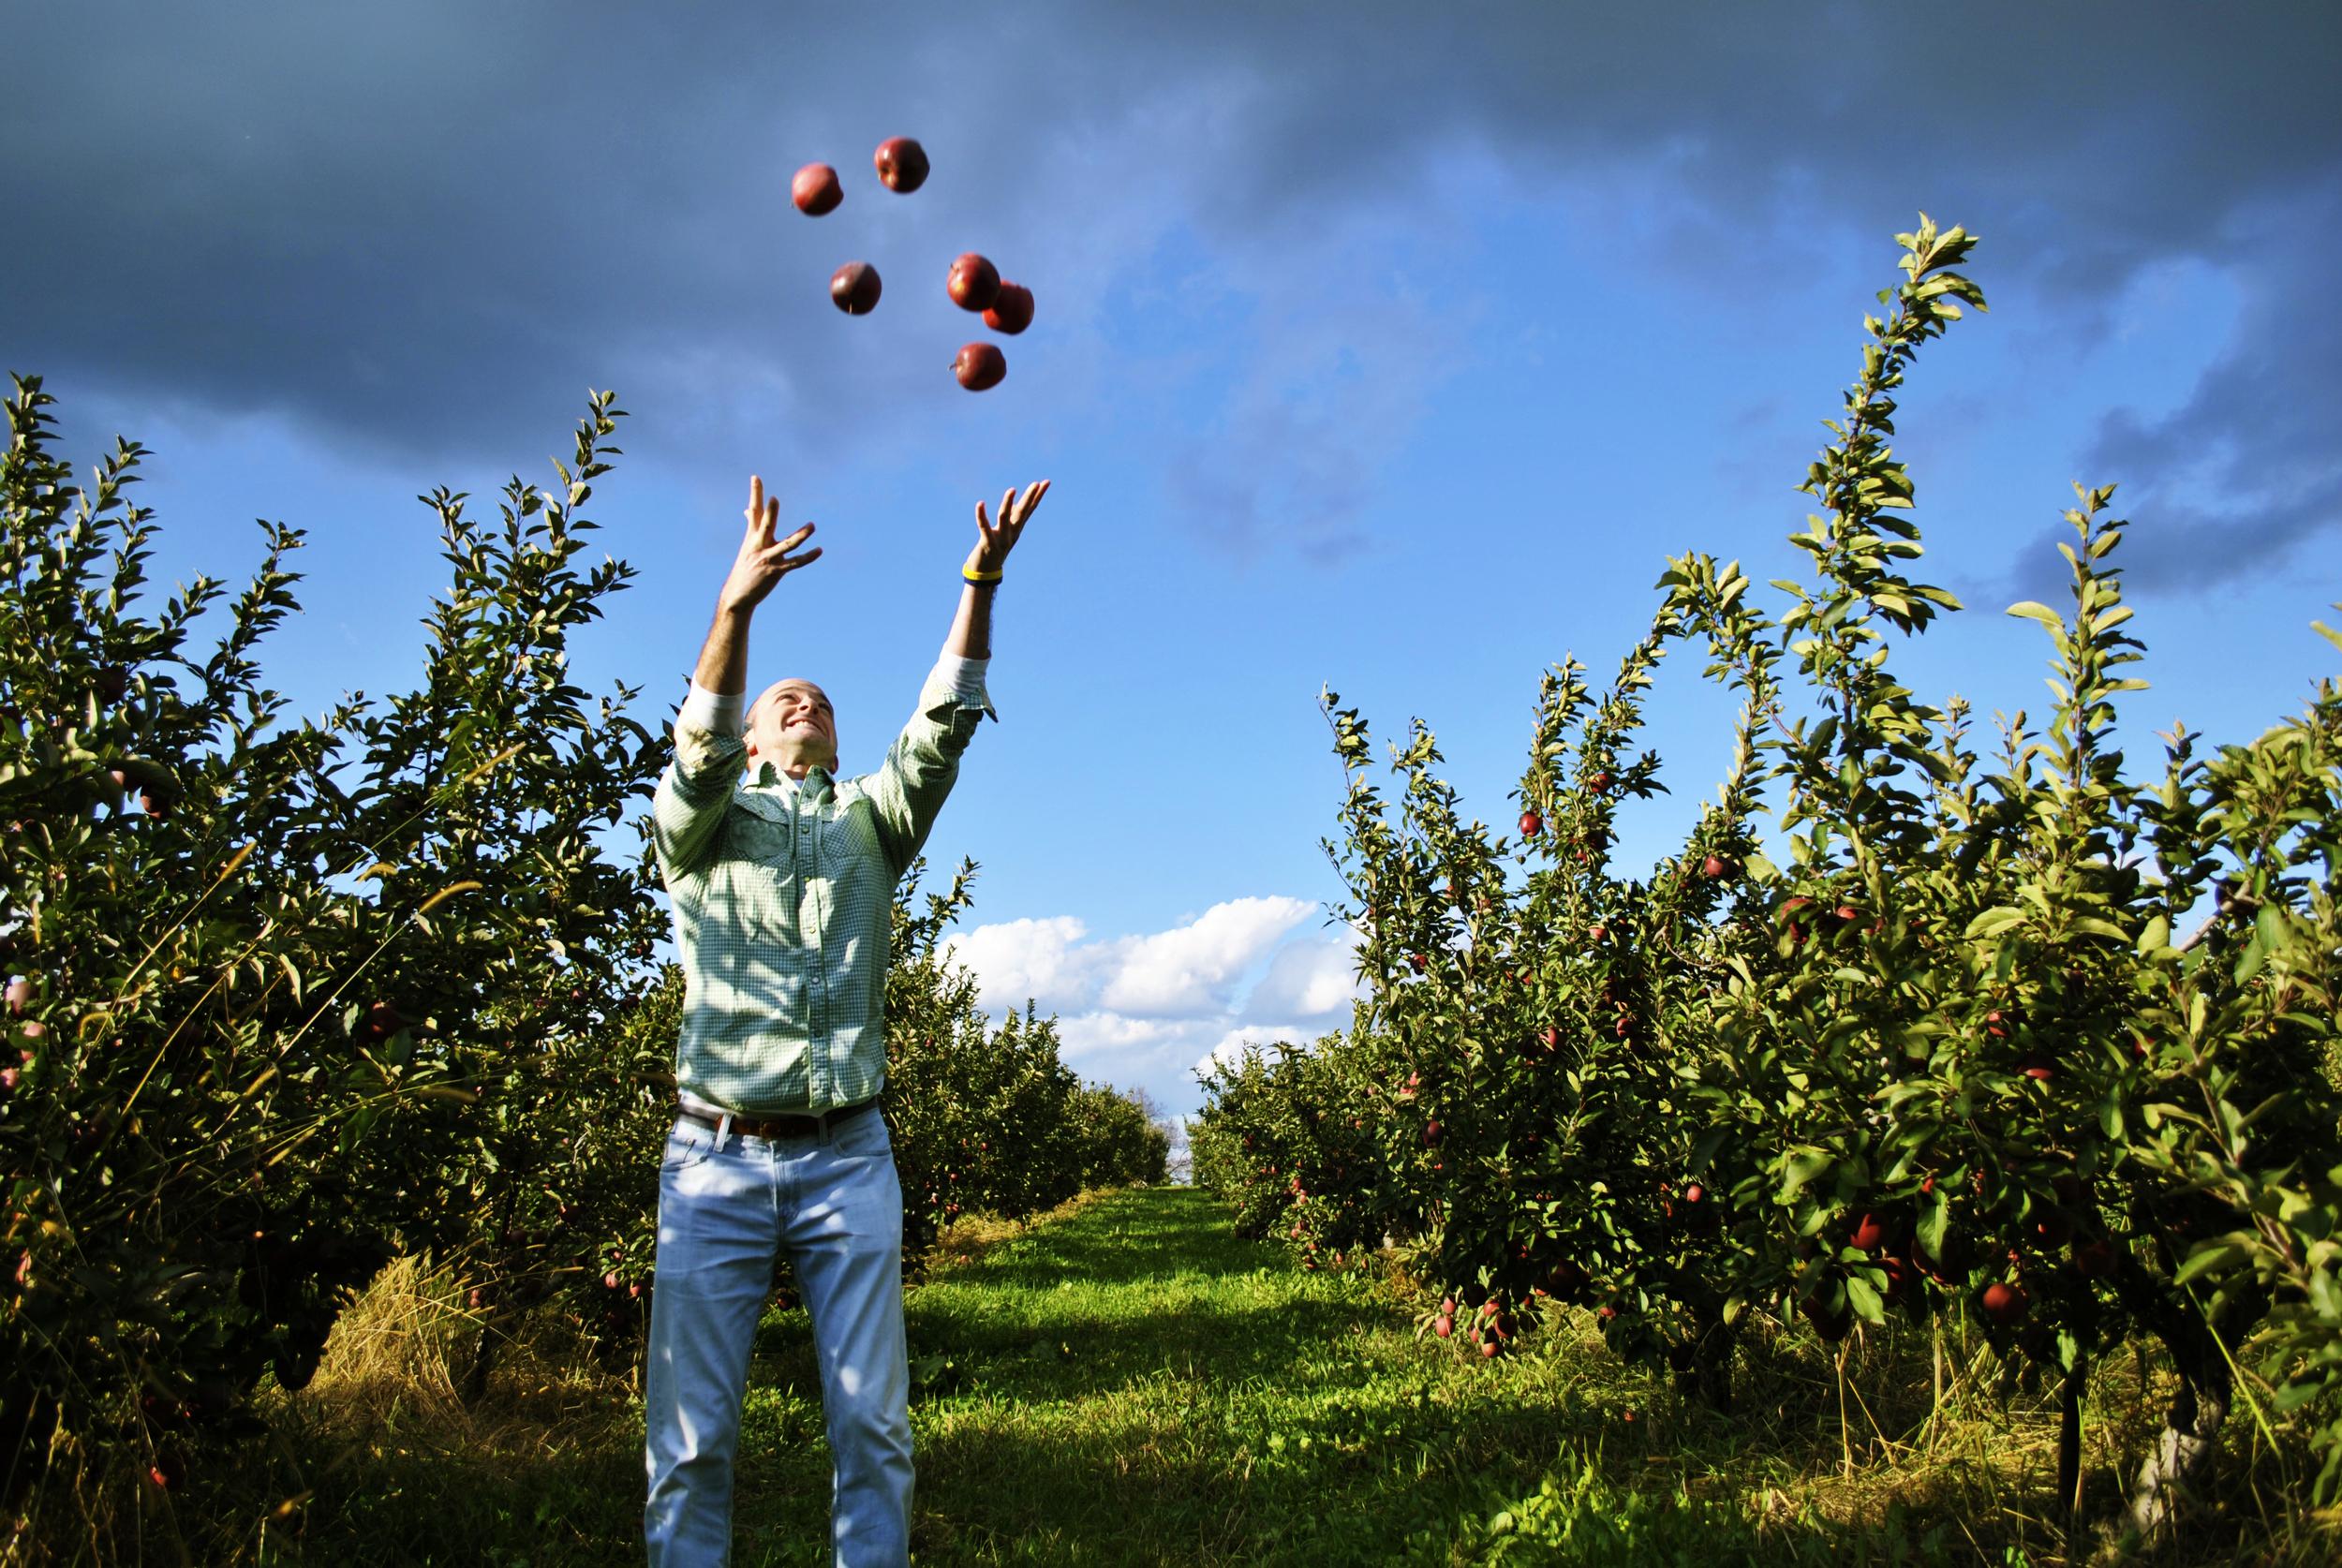 Apple season in the Hudson Valley